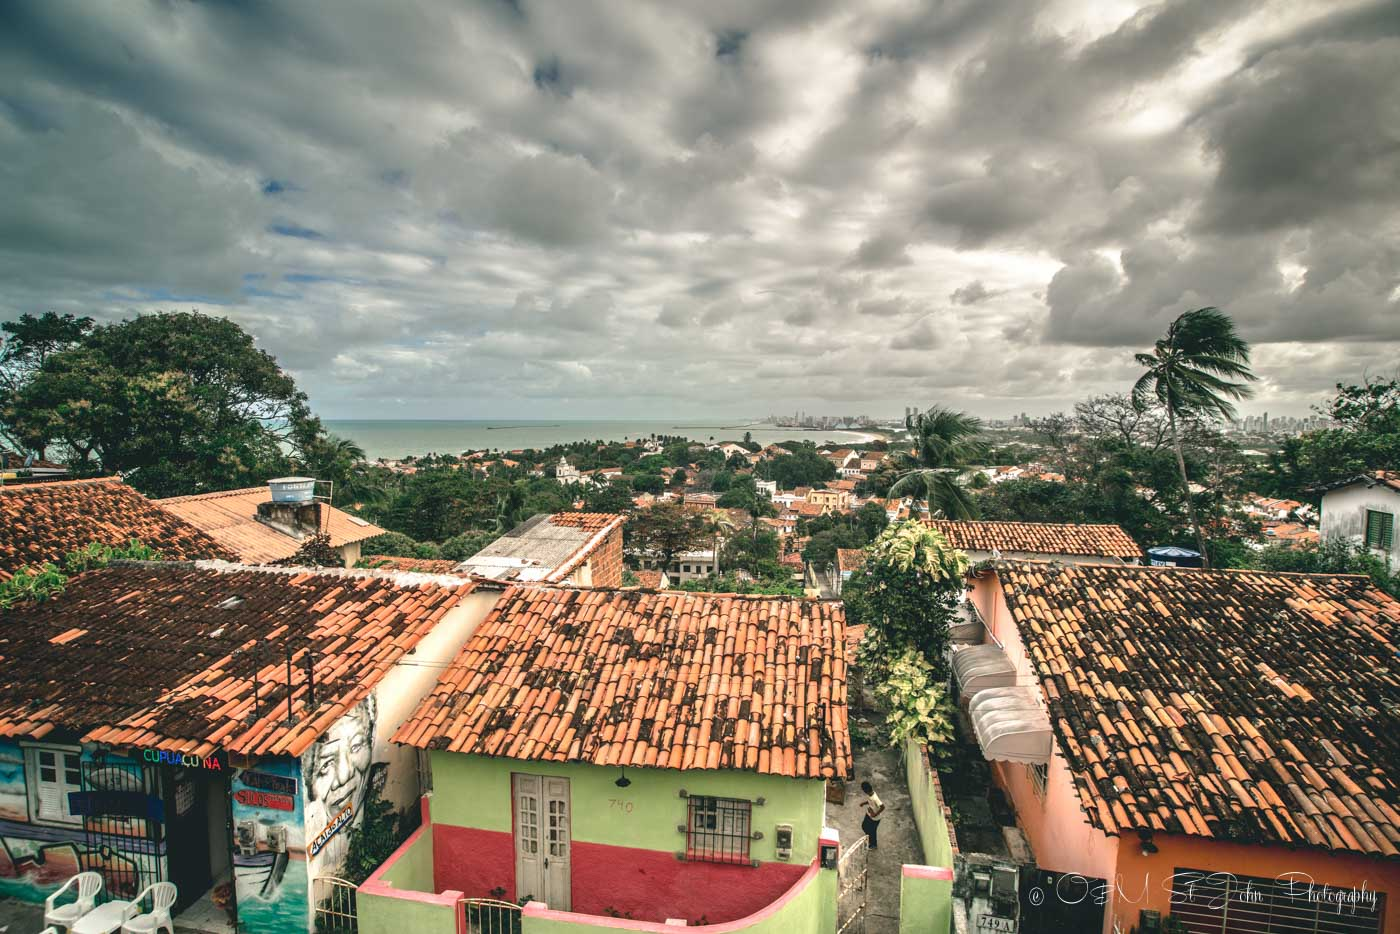 Overlooking the town of Olinda, Northeast Brazil